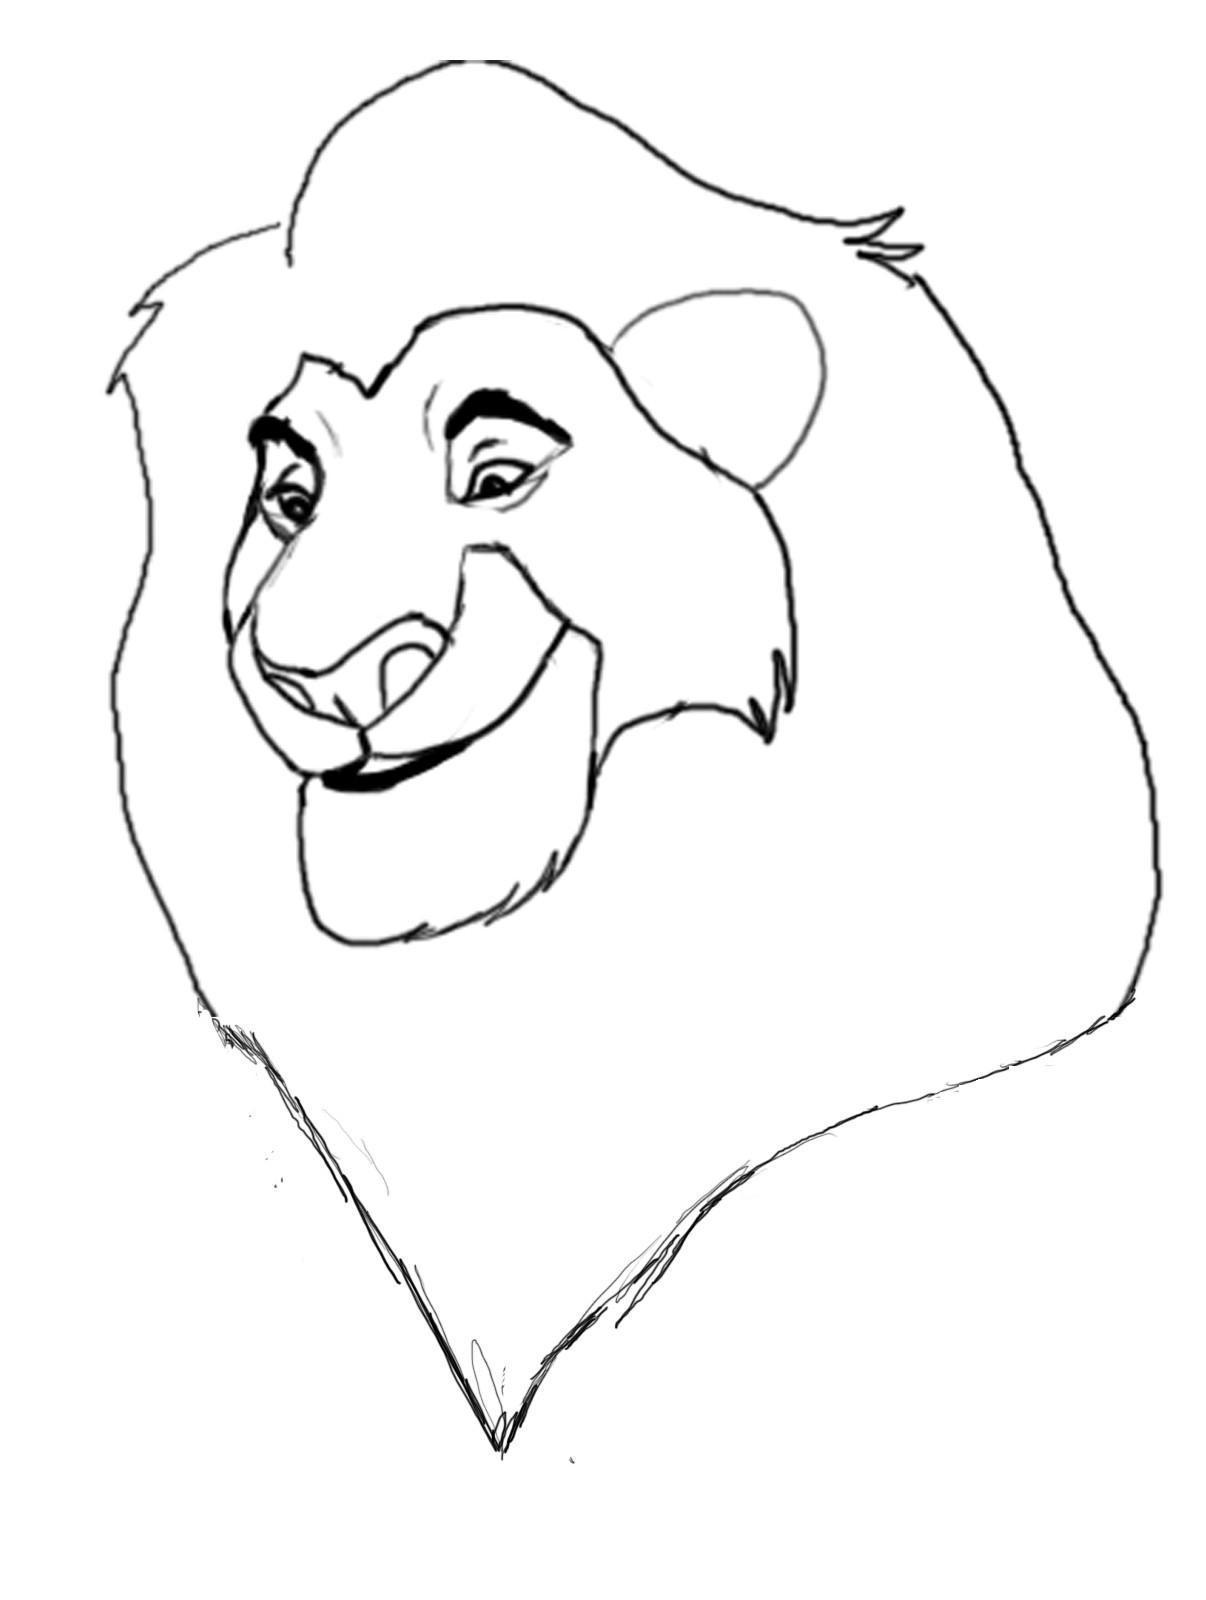 Cómo Dibujar Personajes Del Rey León Con Photoshop Ubiquitourcom